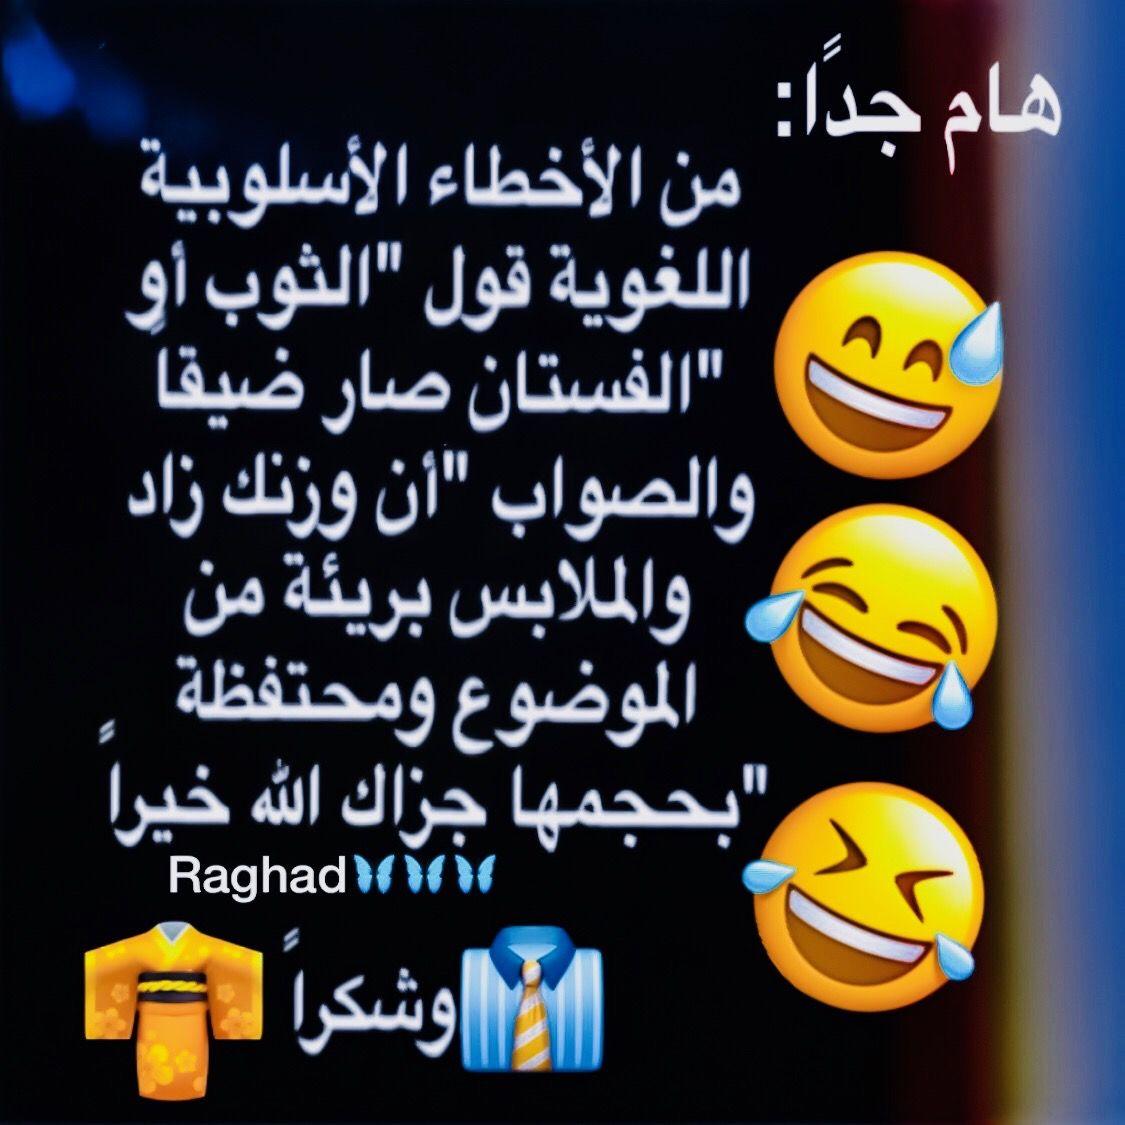 Desertrose جزاكم الله خير ا وشكر ا Funny Quotes Ramadan Kareem Funny Pictures